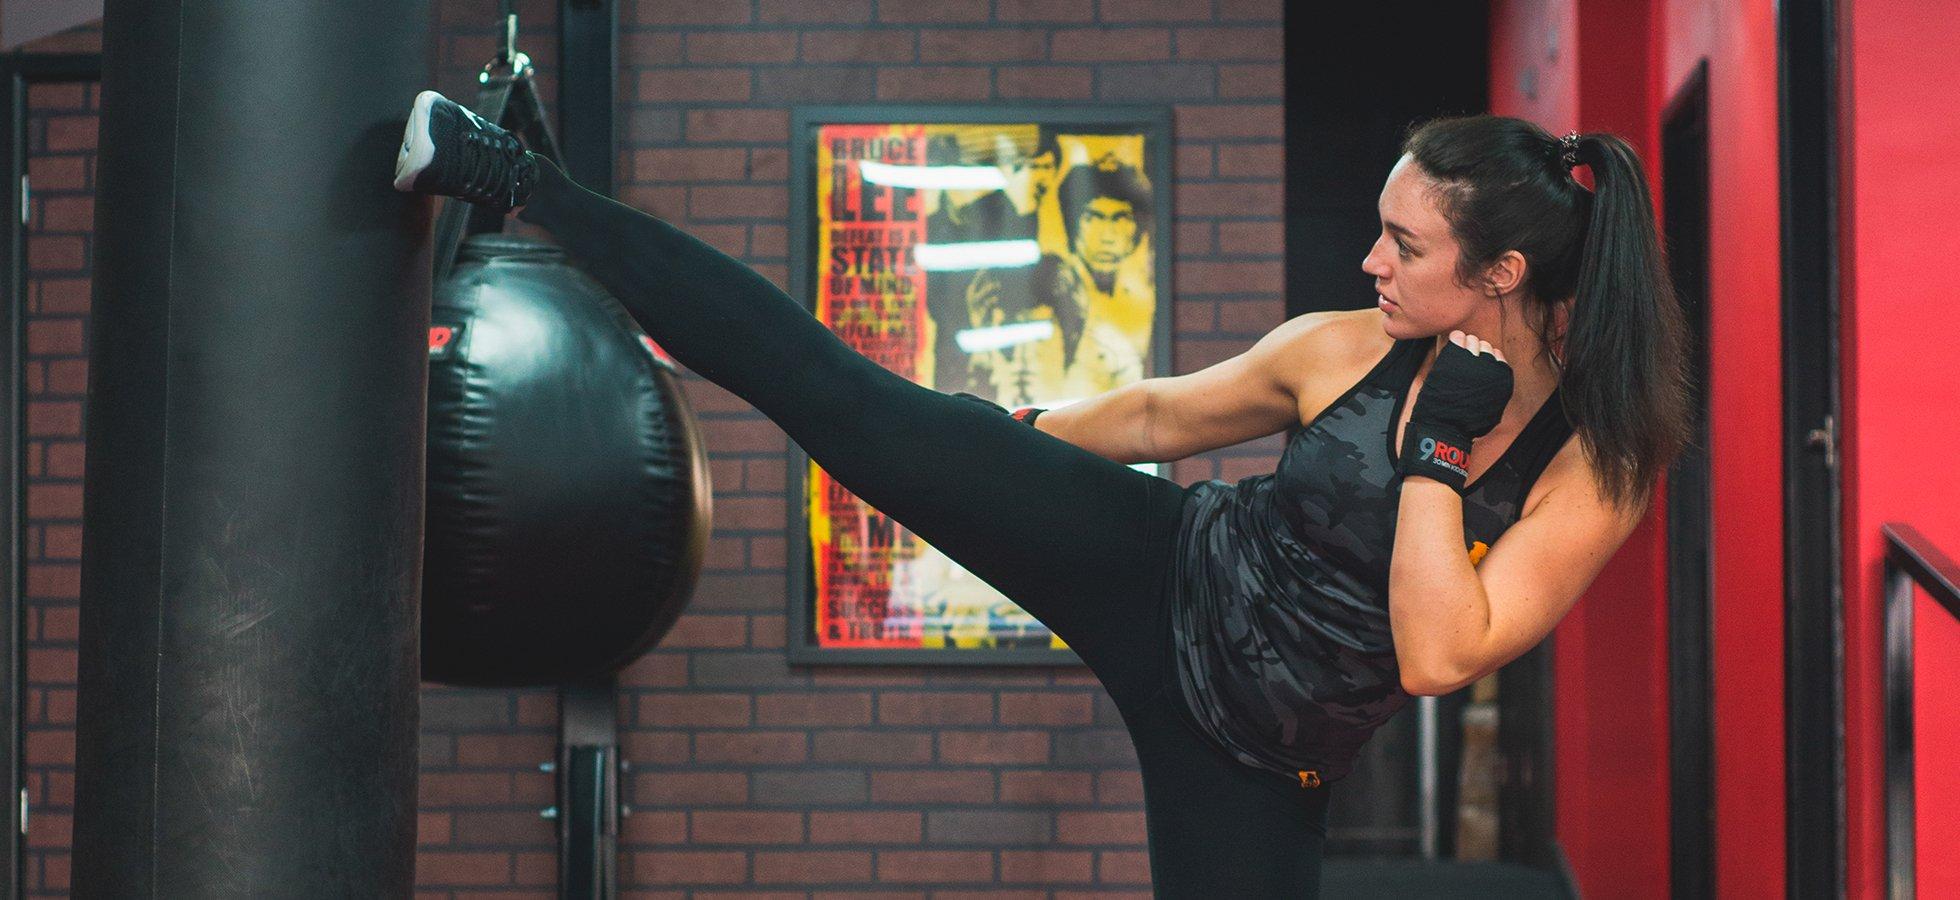 Benefits of Kickboxing